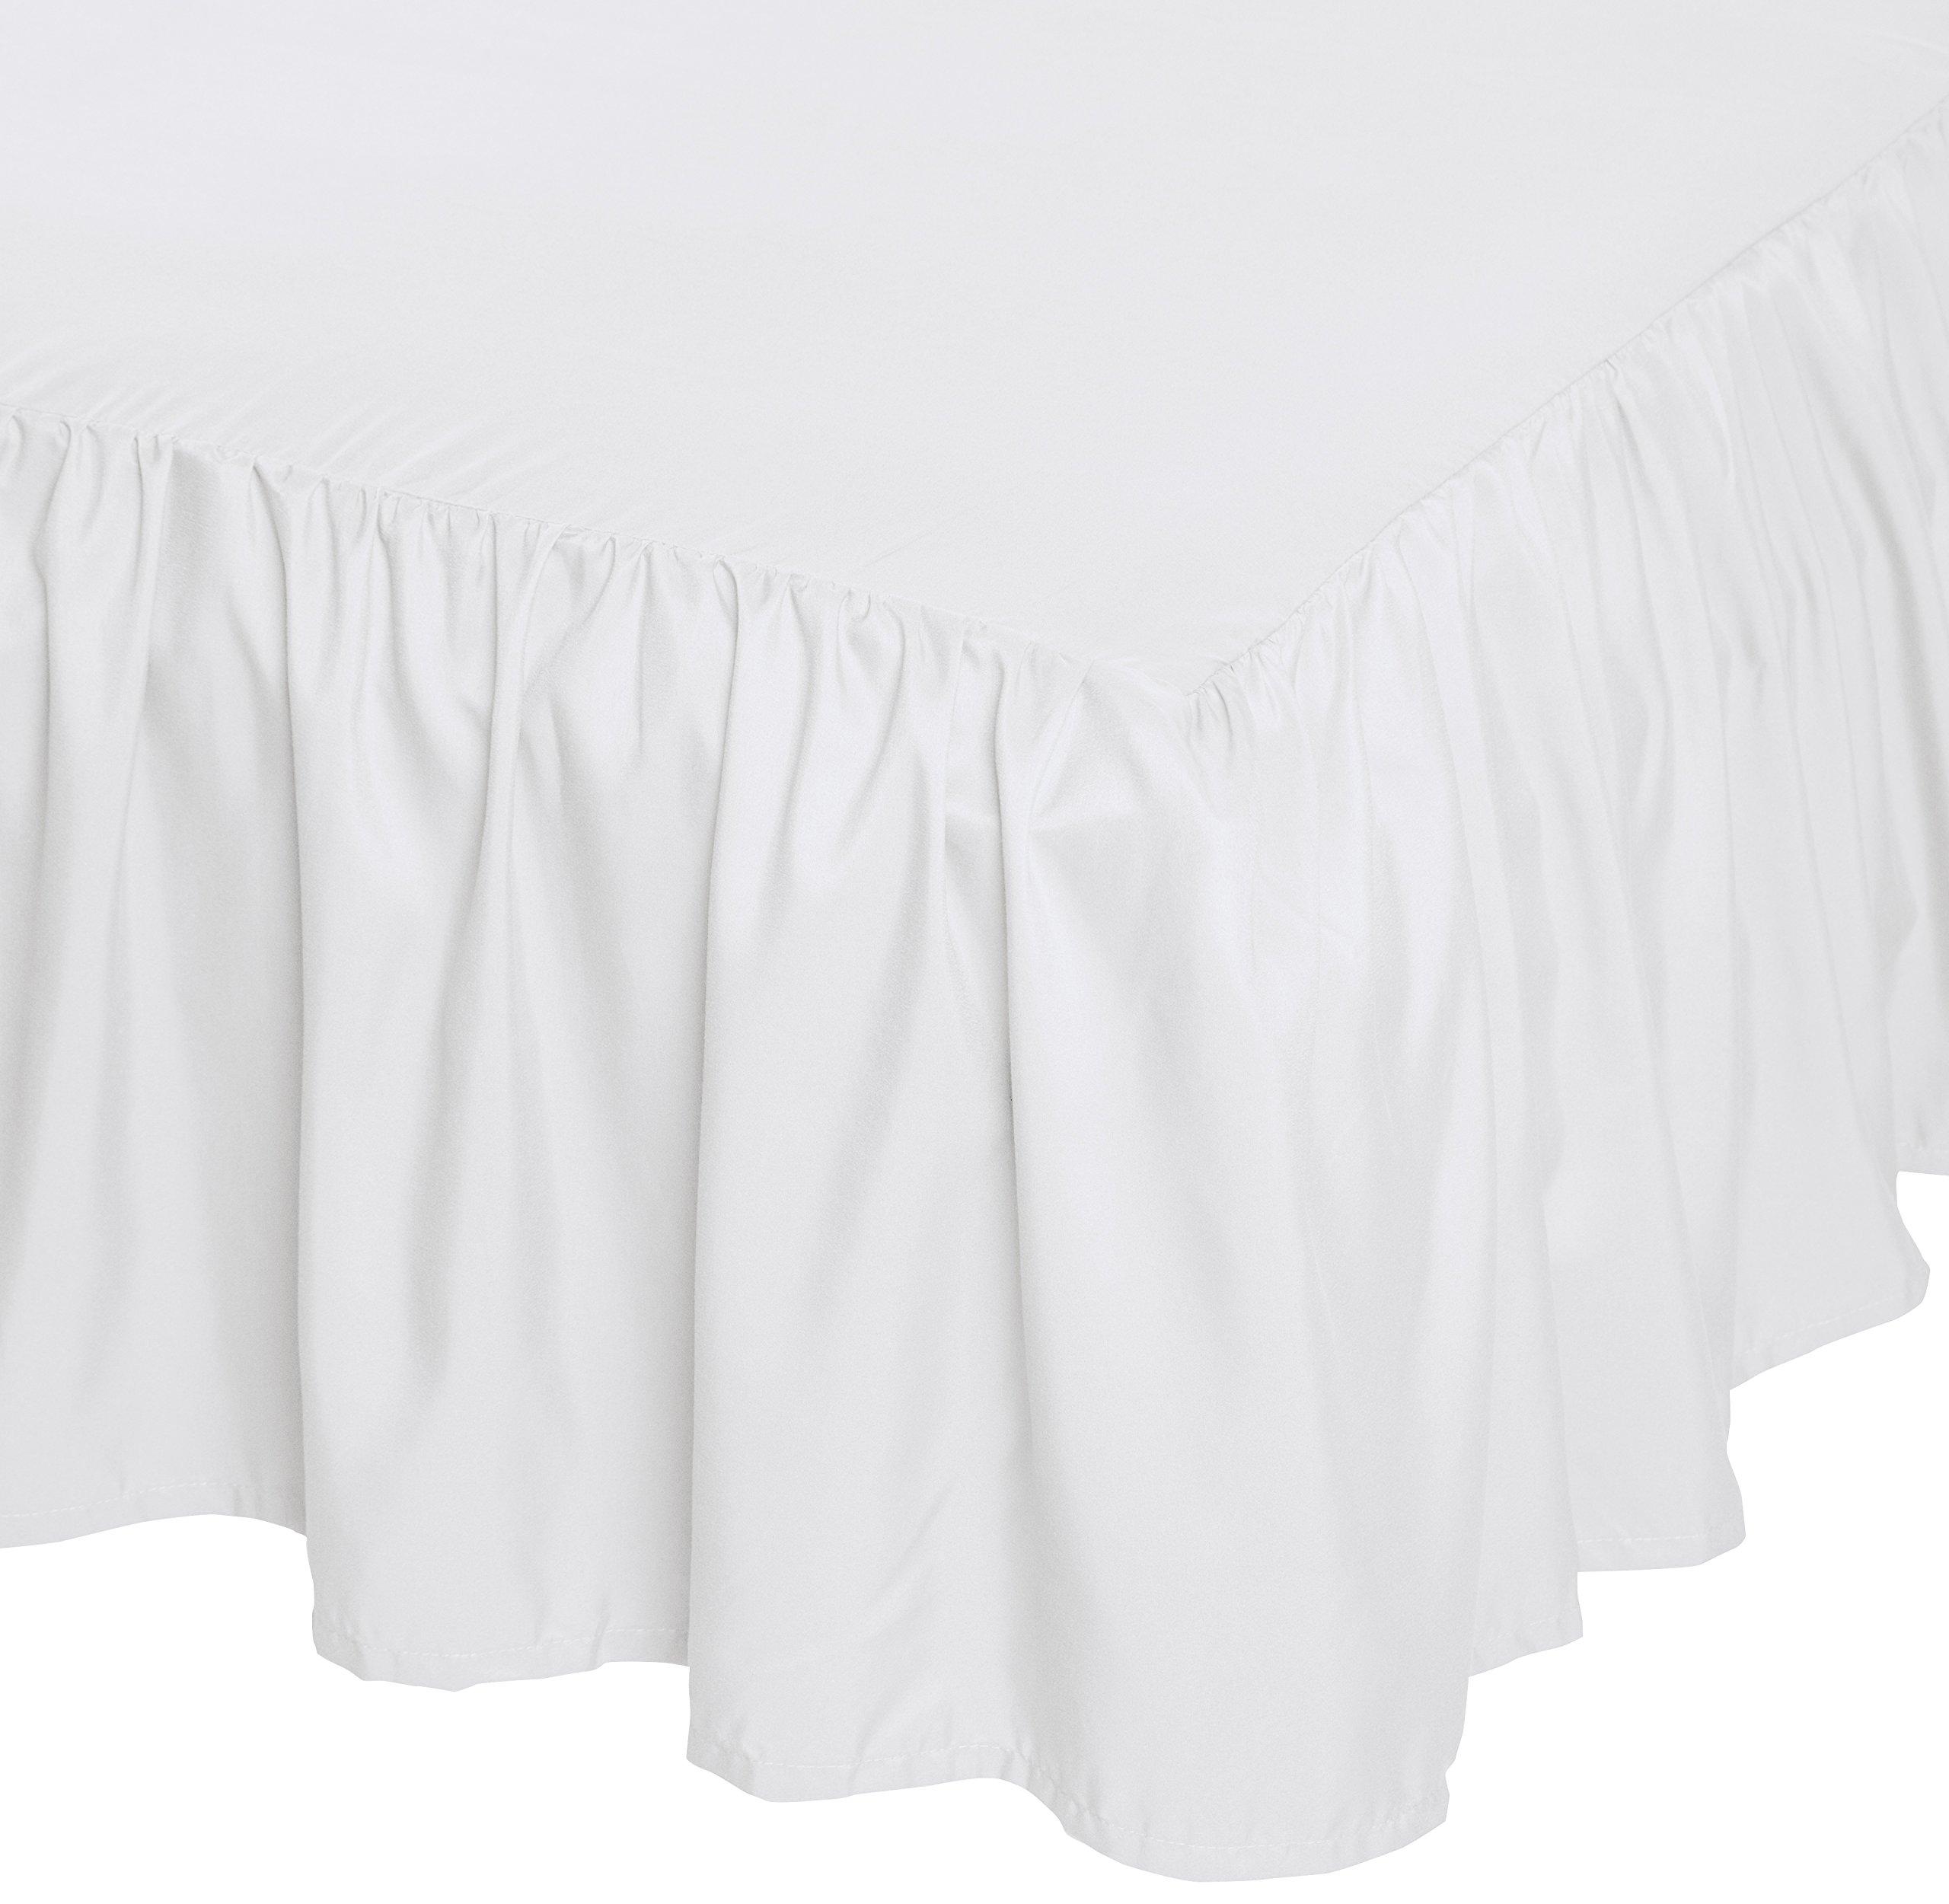 AmazonBasics Ruffled Bed Skirt, 16 Inch Skirt Length, Queen, Bright White by AmazonBasics